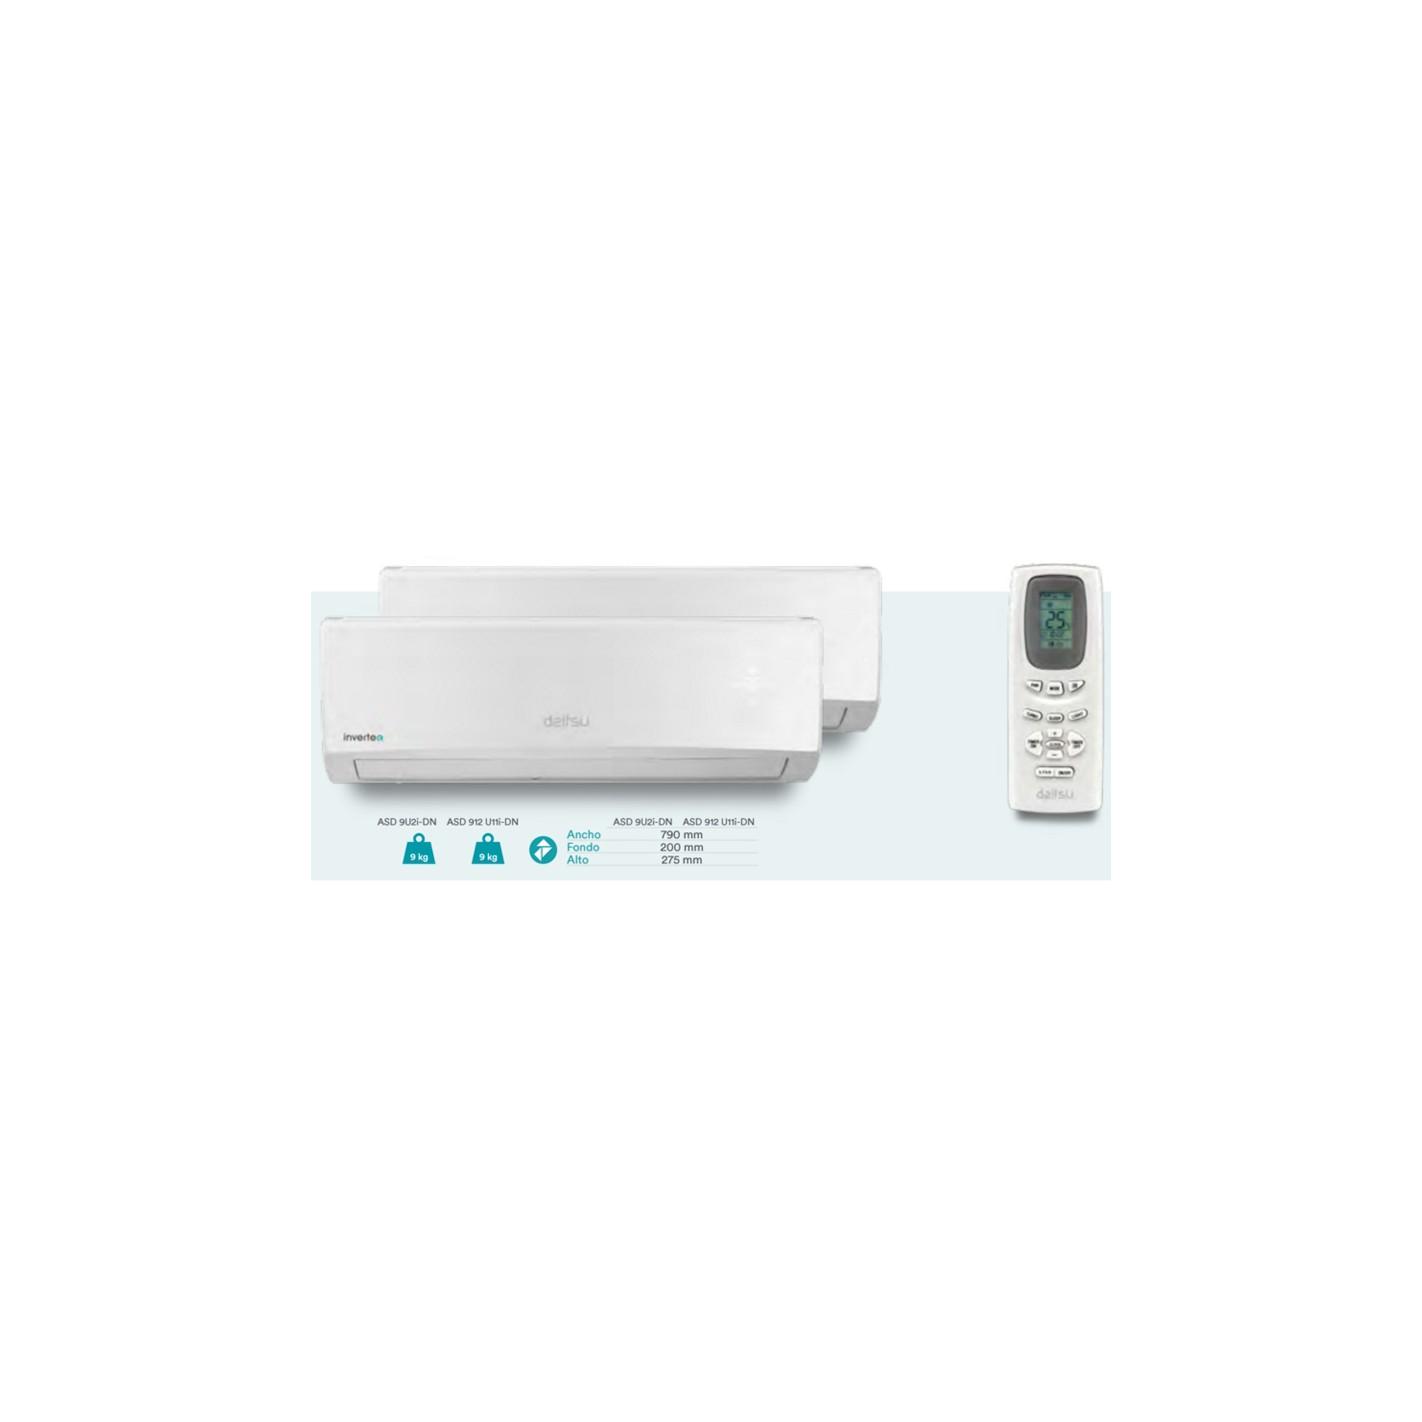 Aire acondicionado 2x1 daitsu asd912u11i dn compra online for Aire acondicionado 2x1